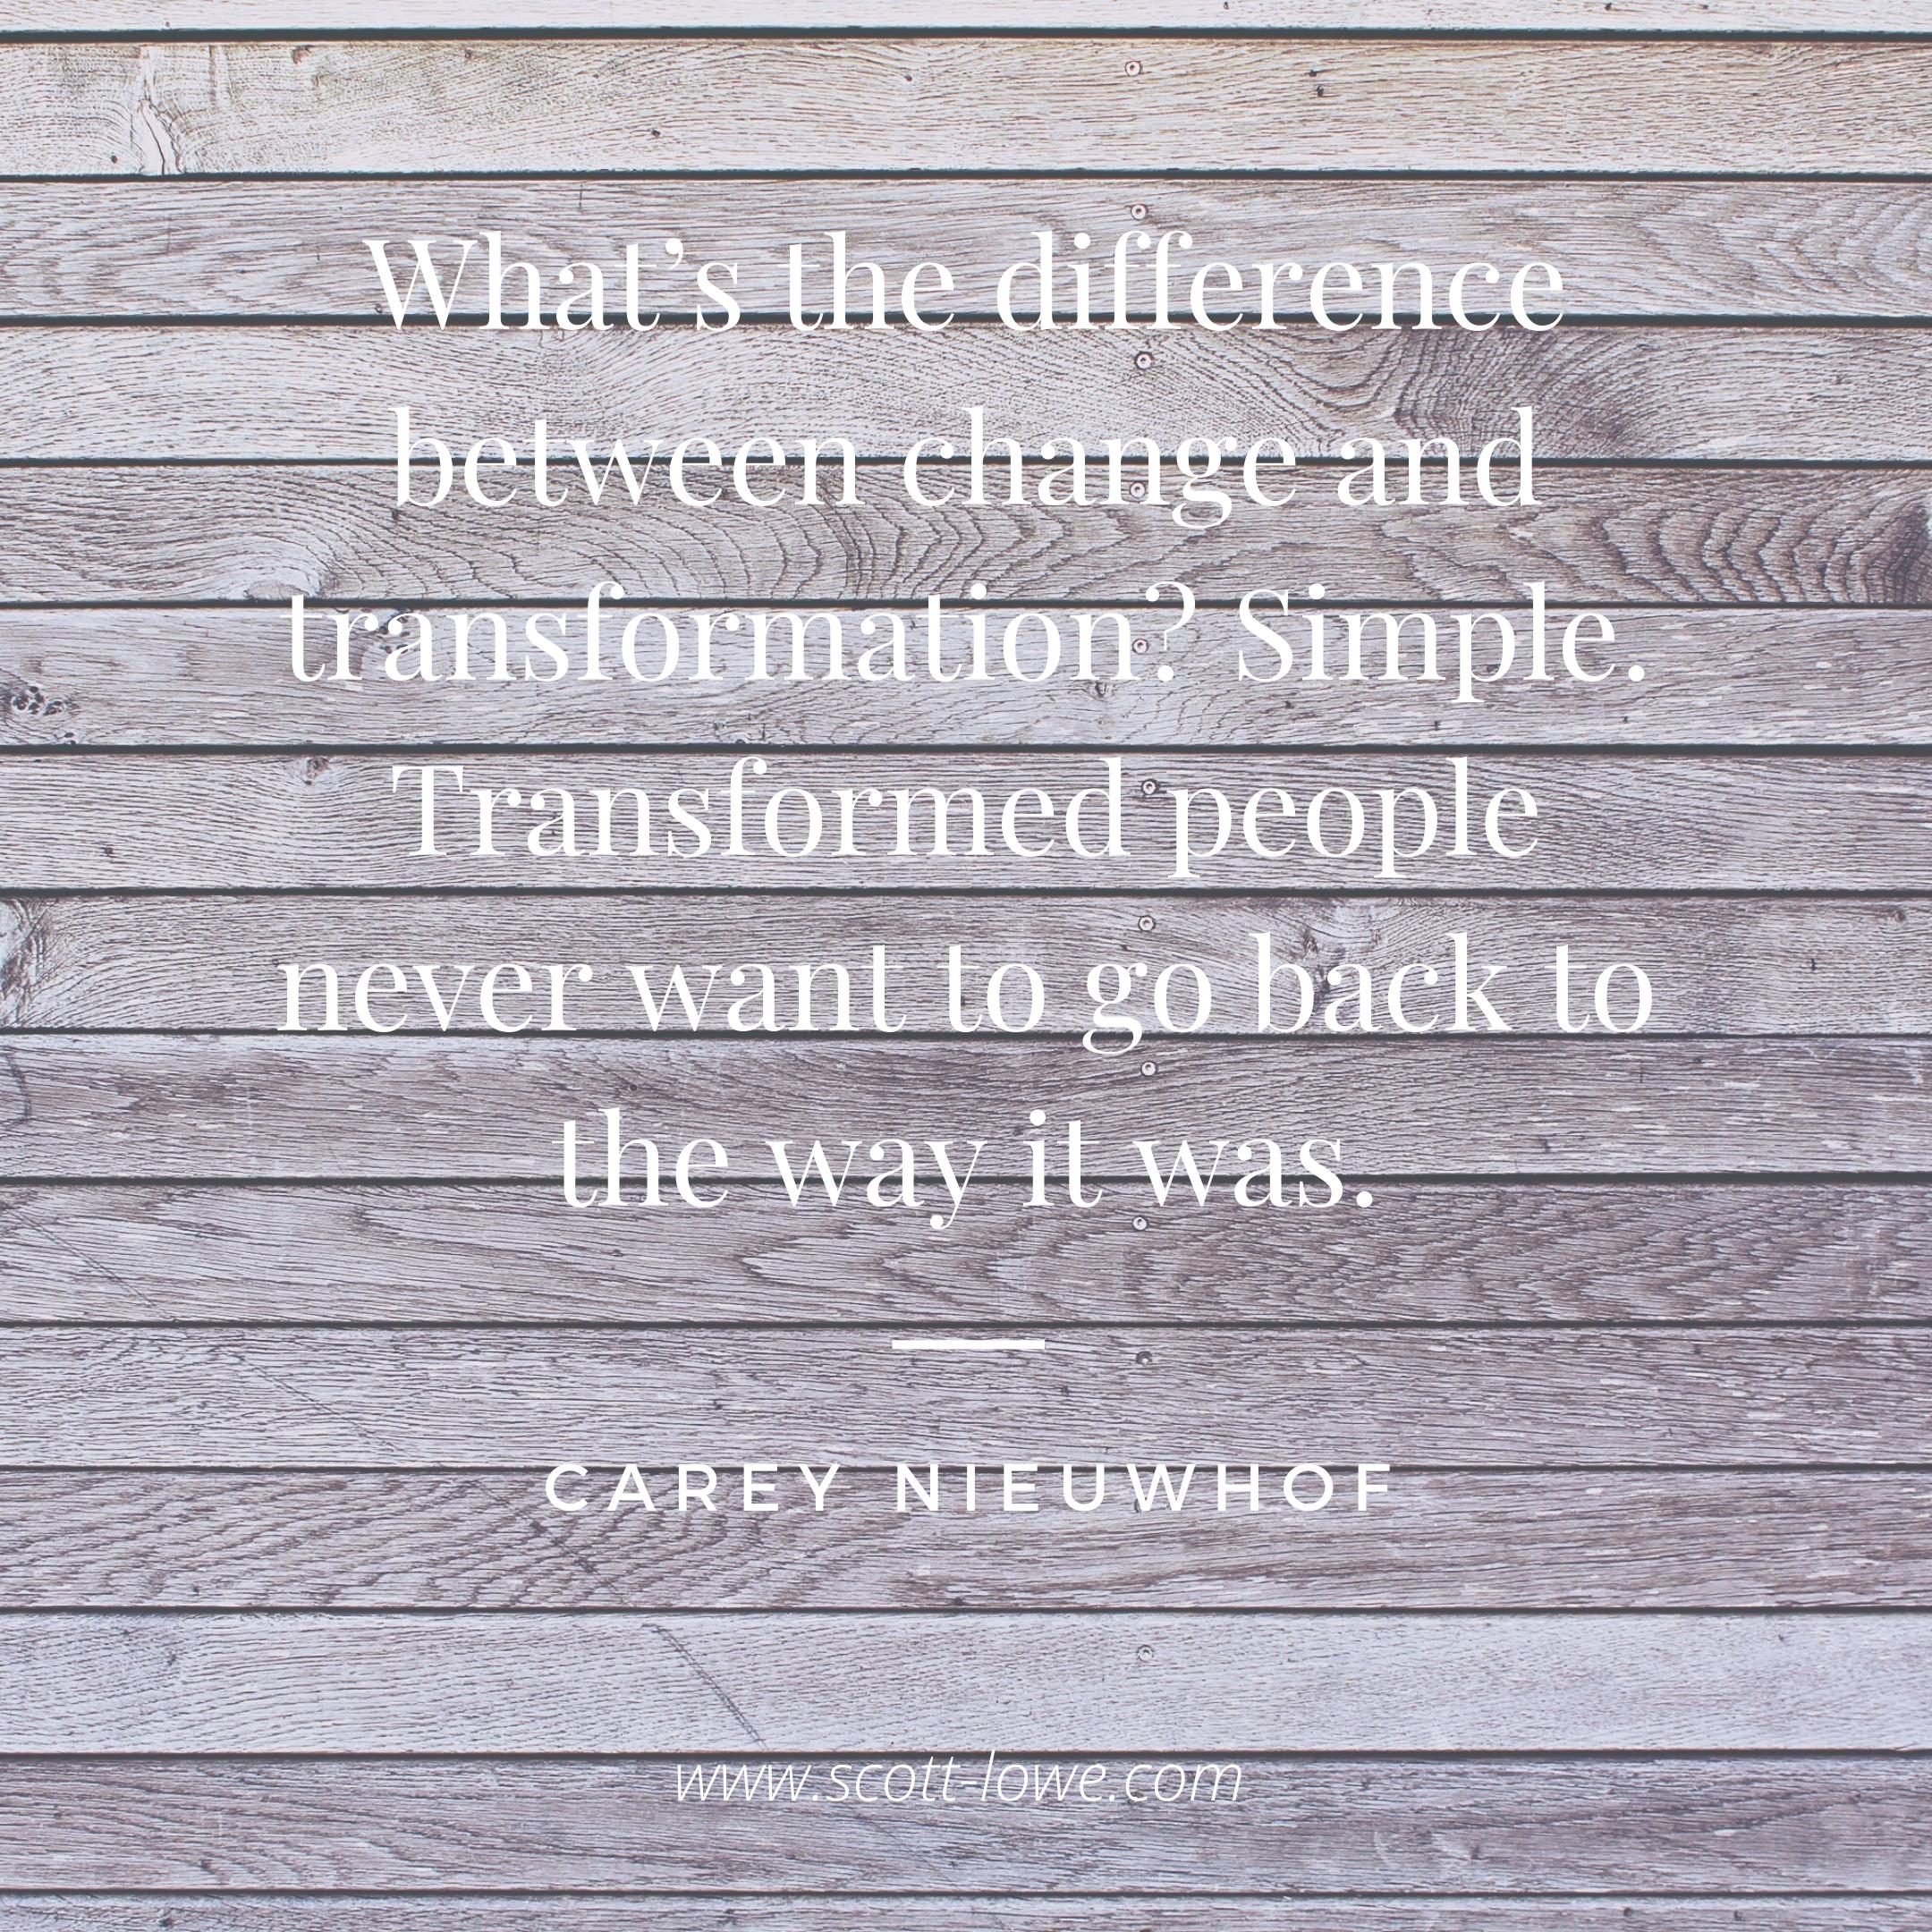 CareyNieuwhof Transformation.png